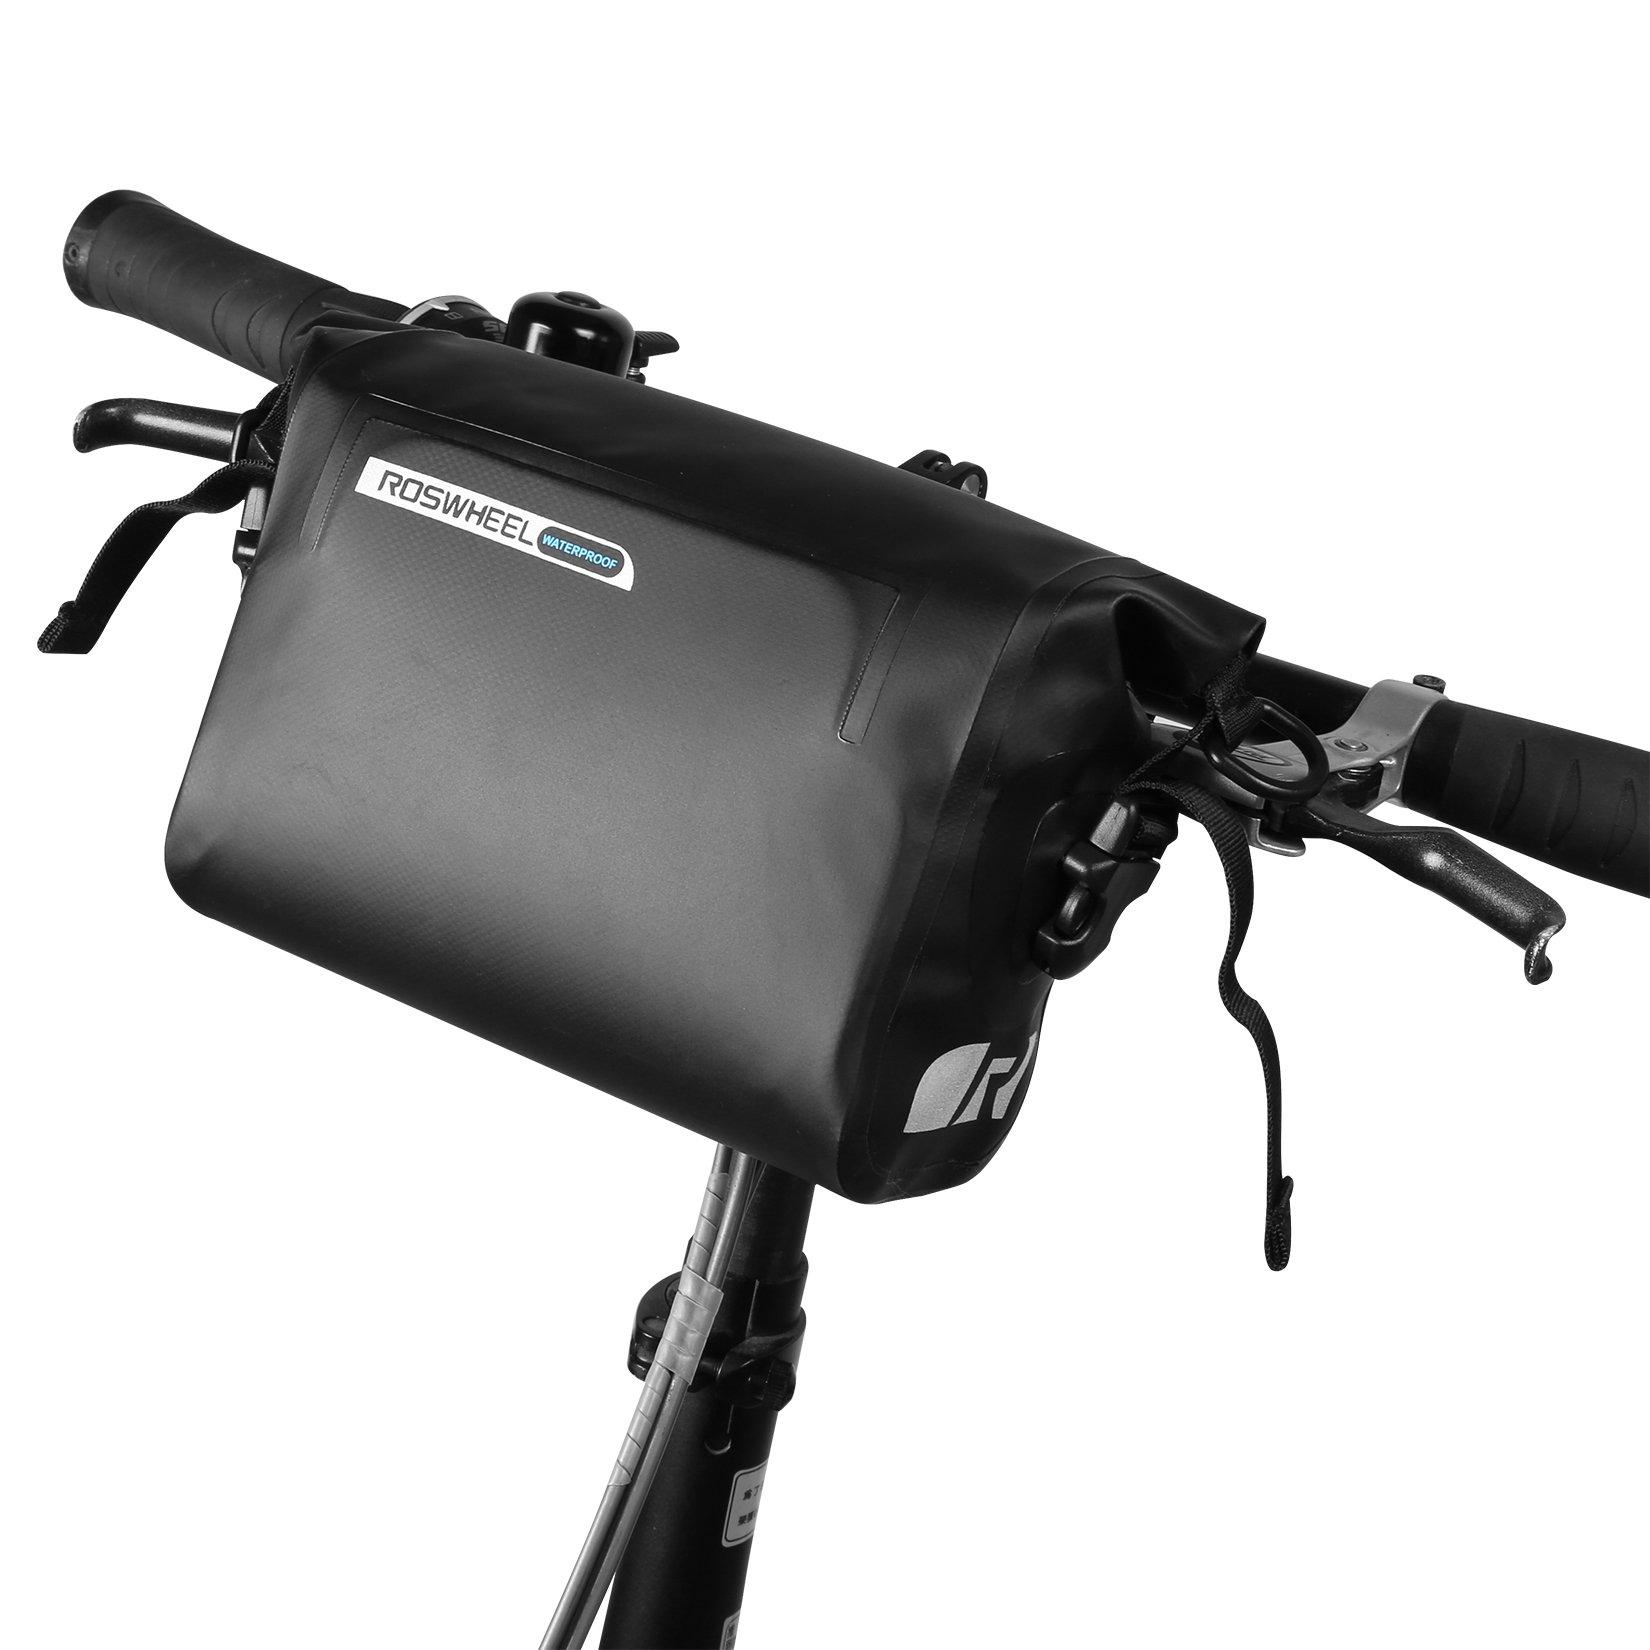 ArcEnCiel Waterproof Handlebar Bag for Bicycle